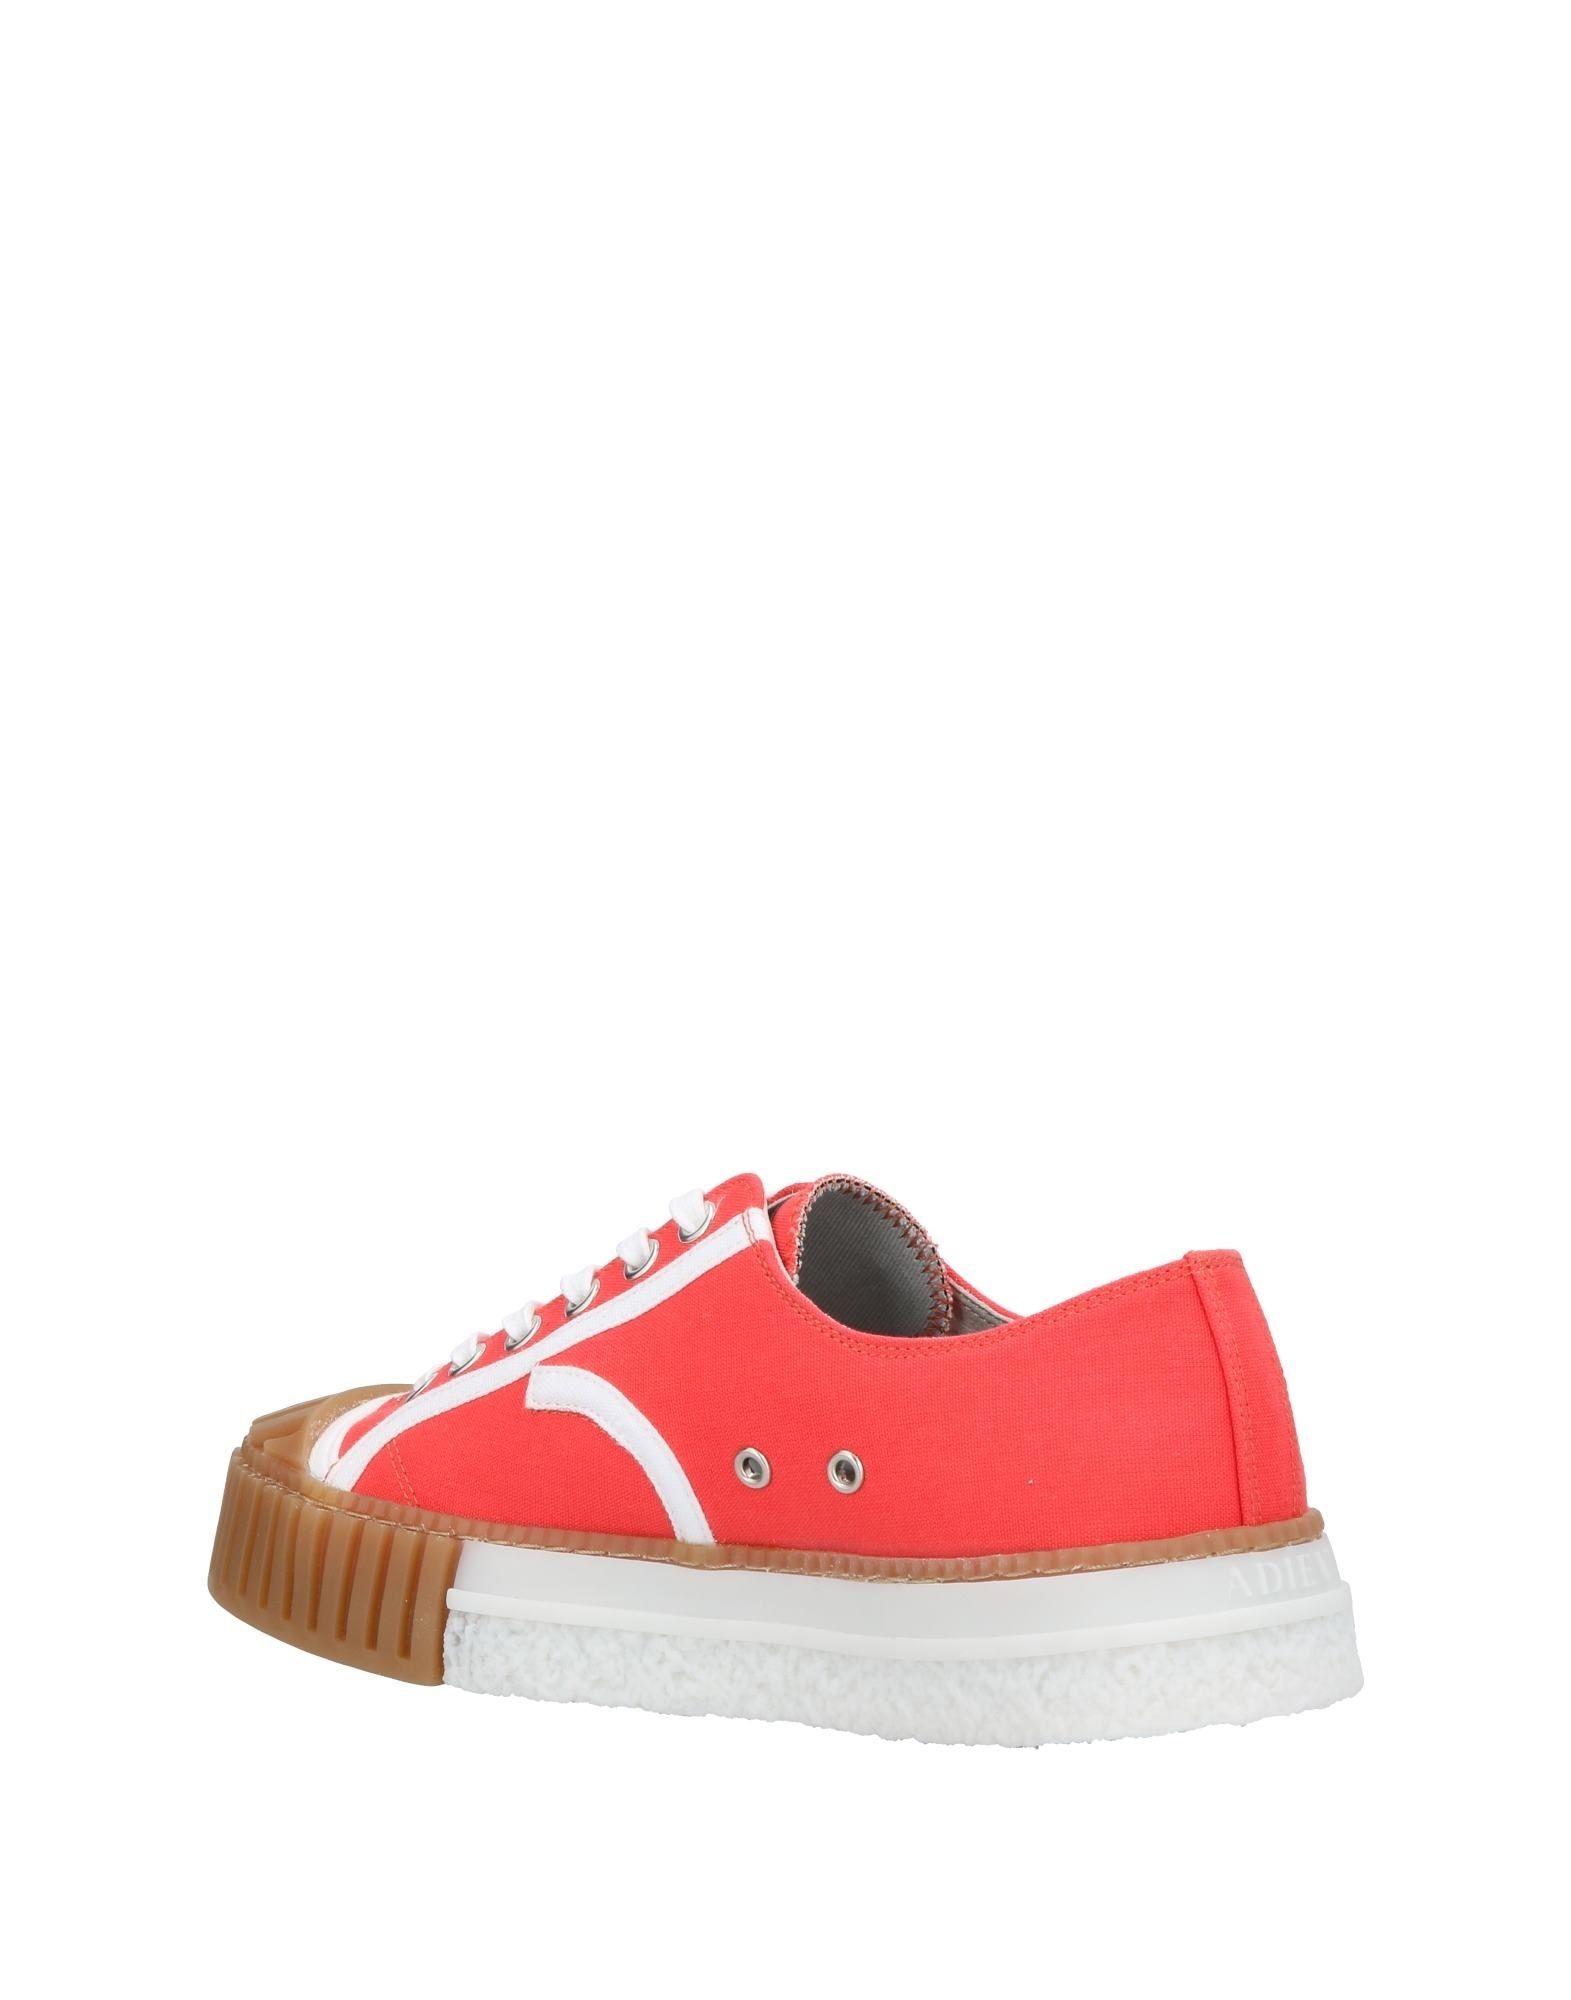 Adieu Sneakers - Women Adieu Sneakers online 11391017MI on  Canada - 11391017MI online 0a43eb